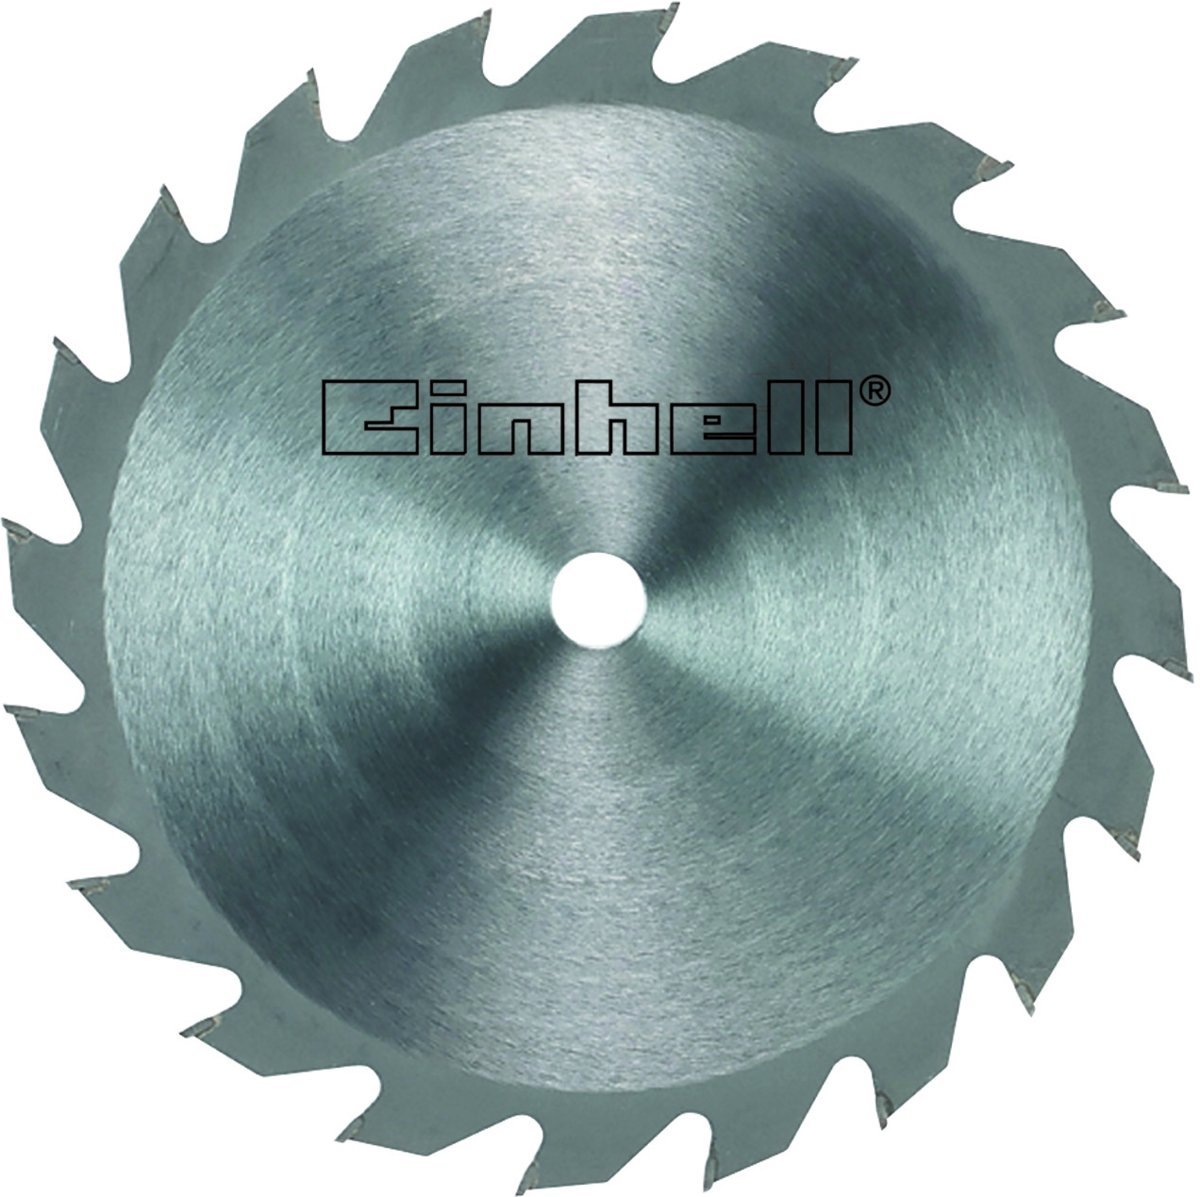 EINHELL Zaagblad 20 T voor tafelcirkelzaag - Ø200 x 16 x 2,8 mm kopen